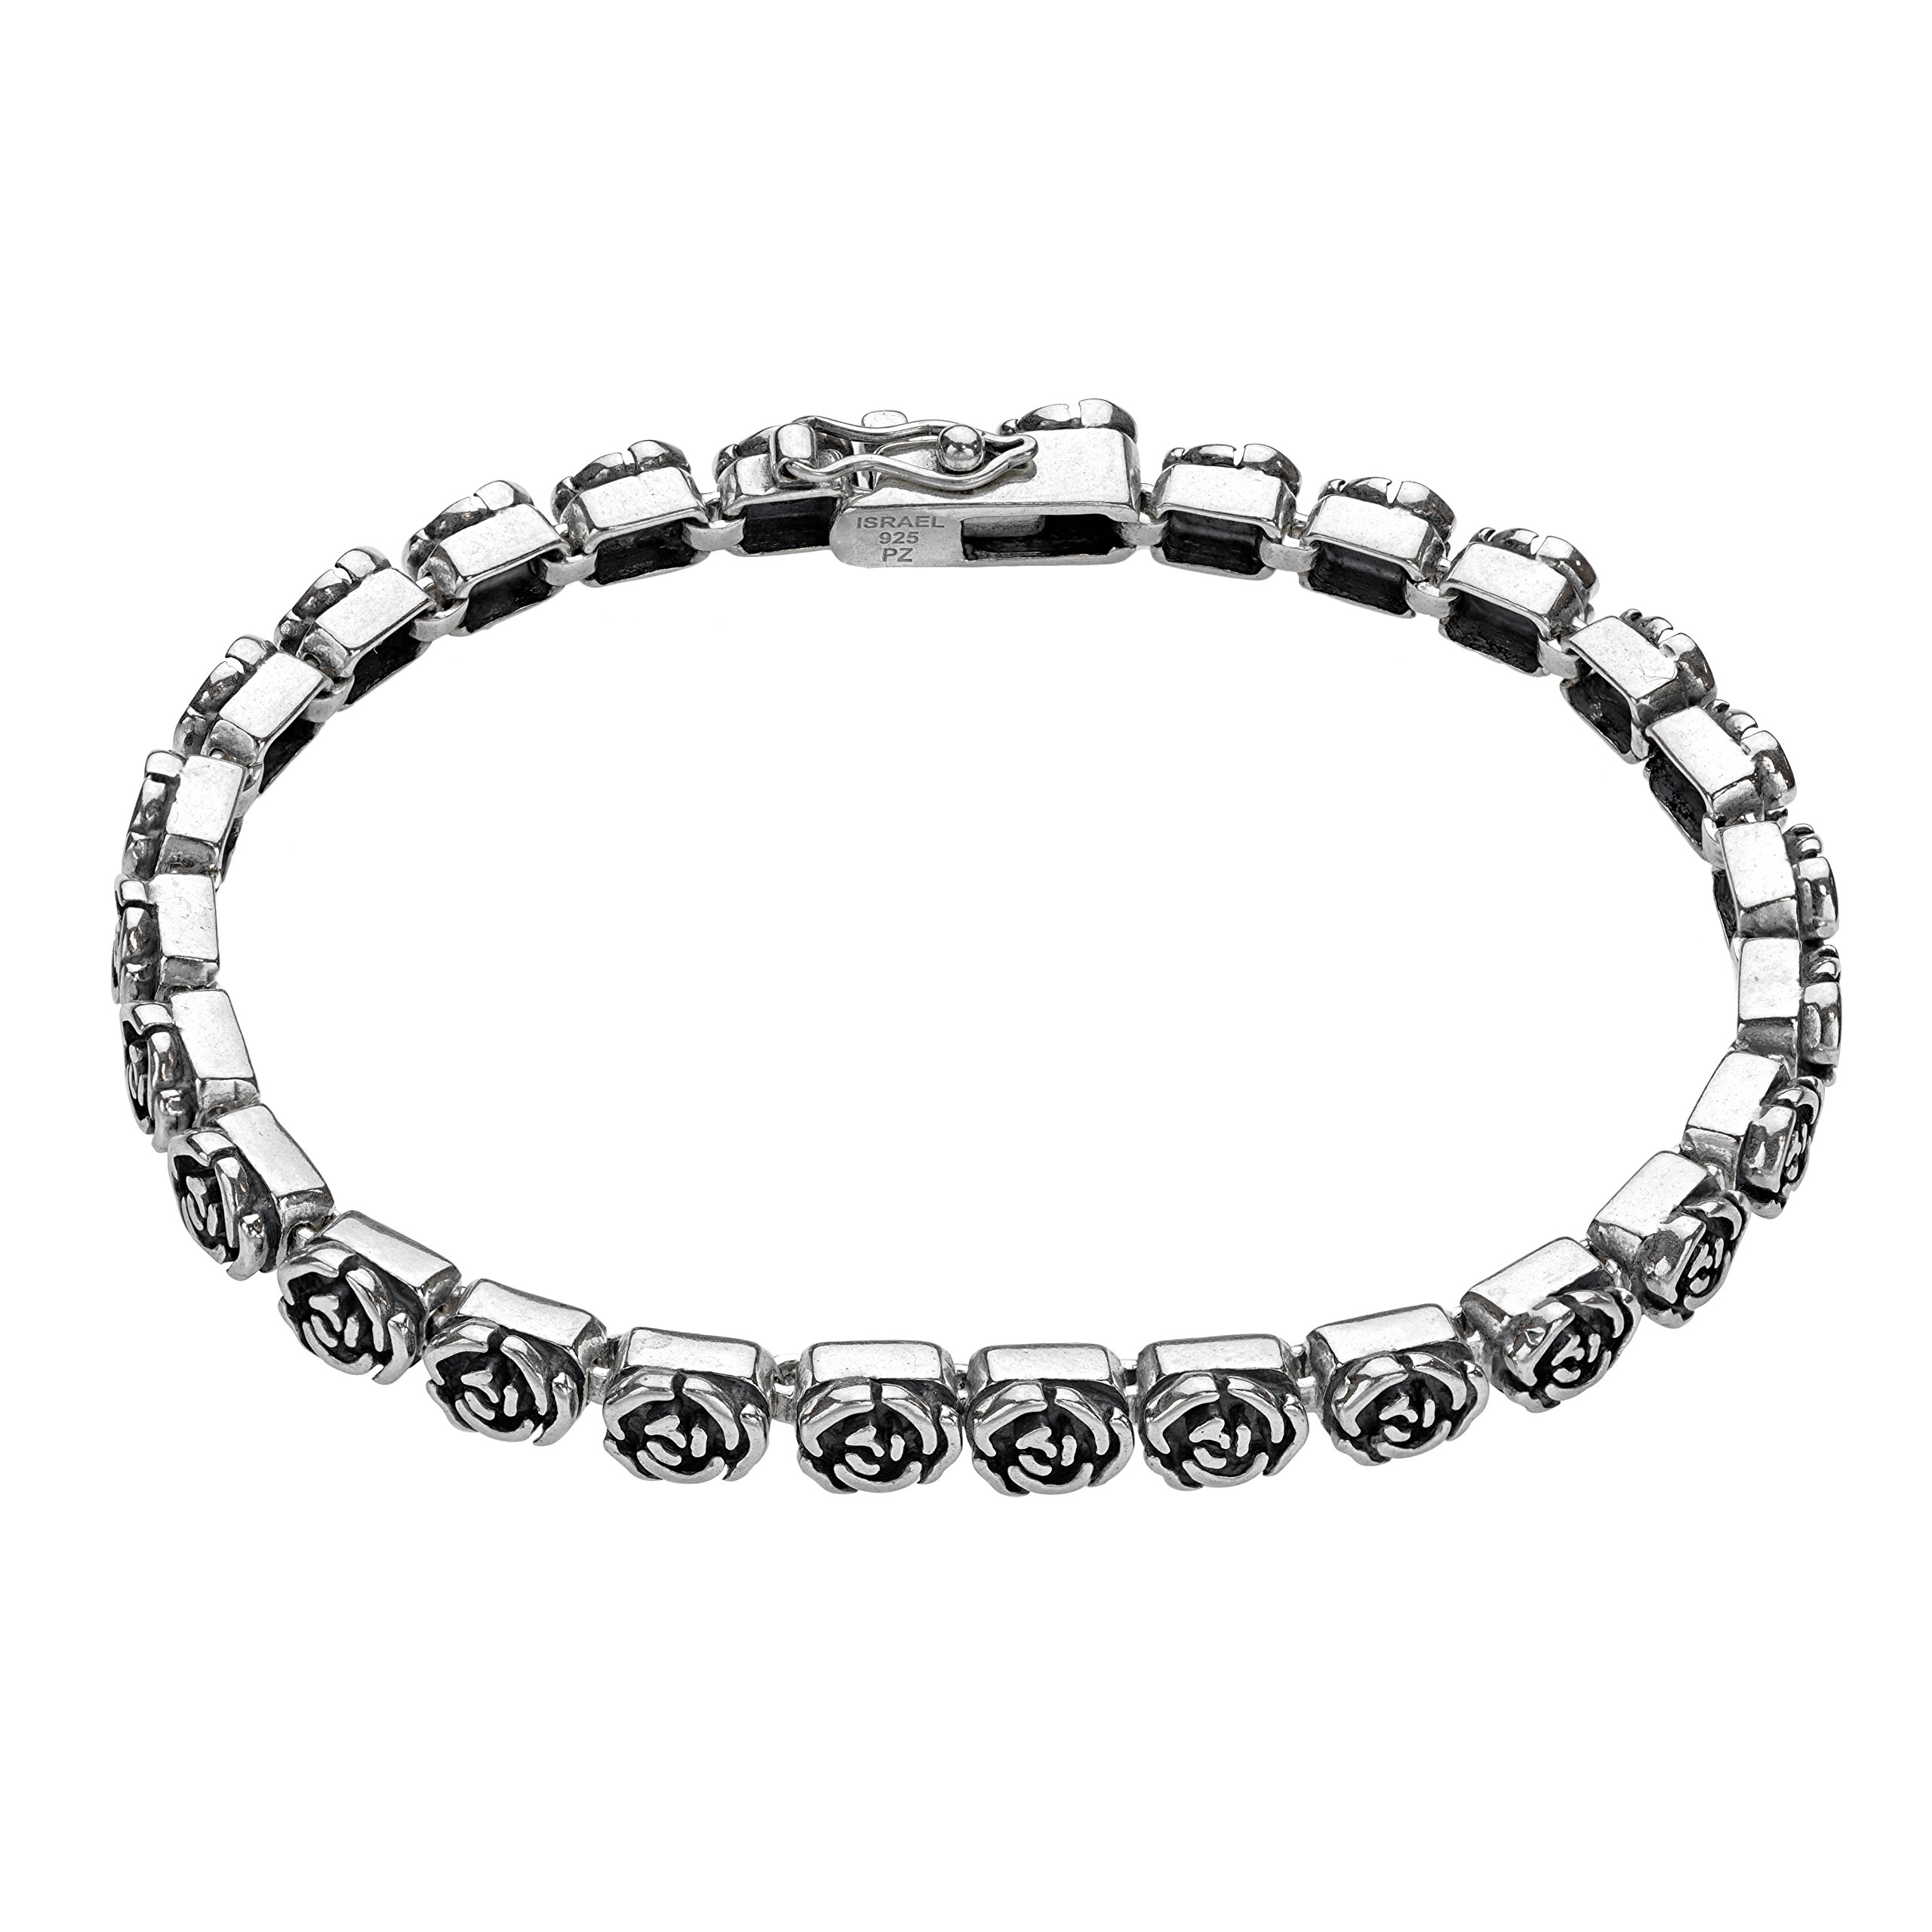 Paz Creations ♥925 Sterling Silver Rose Design Tennis Bracelet, Made in Israel (8)